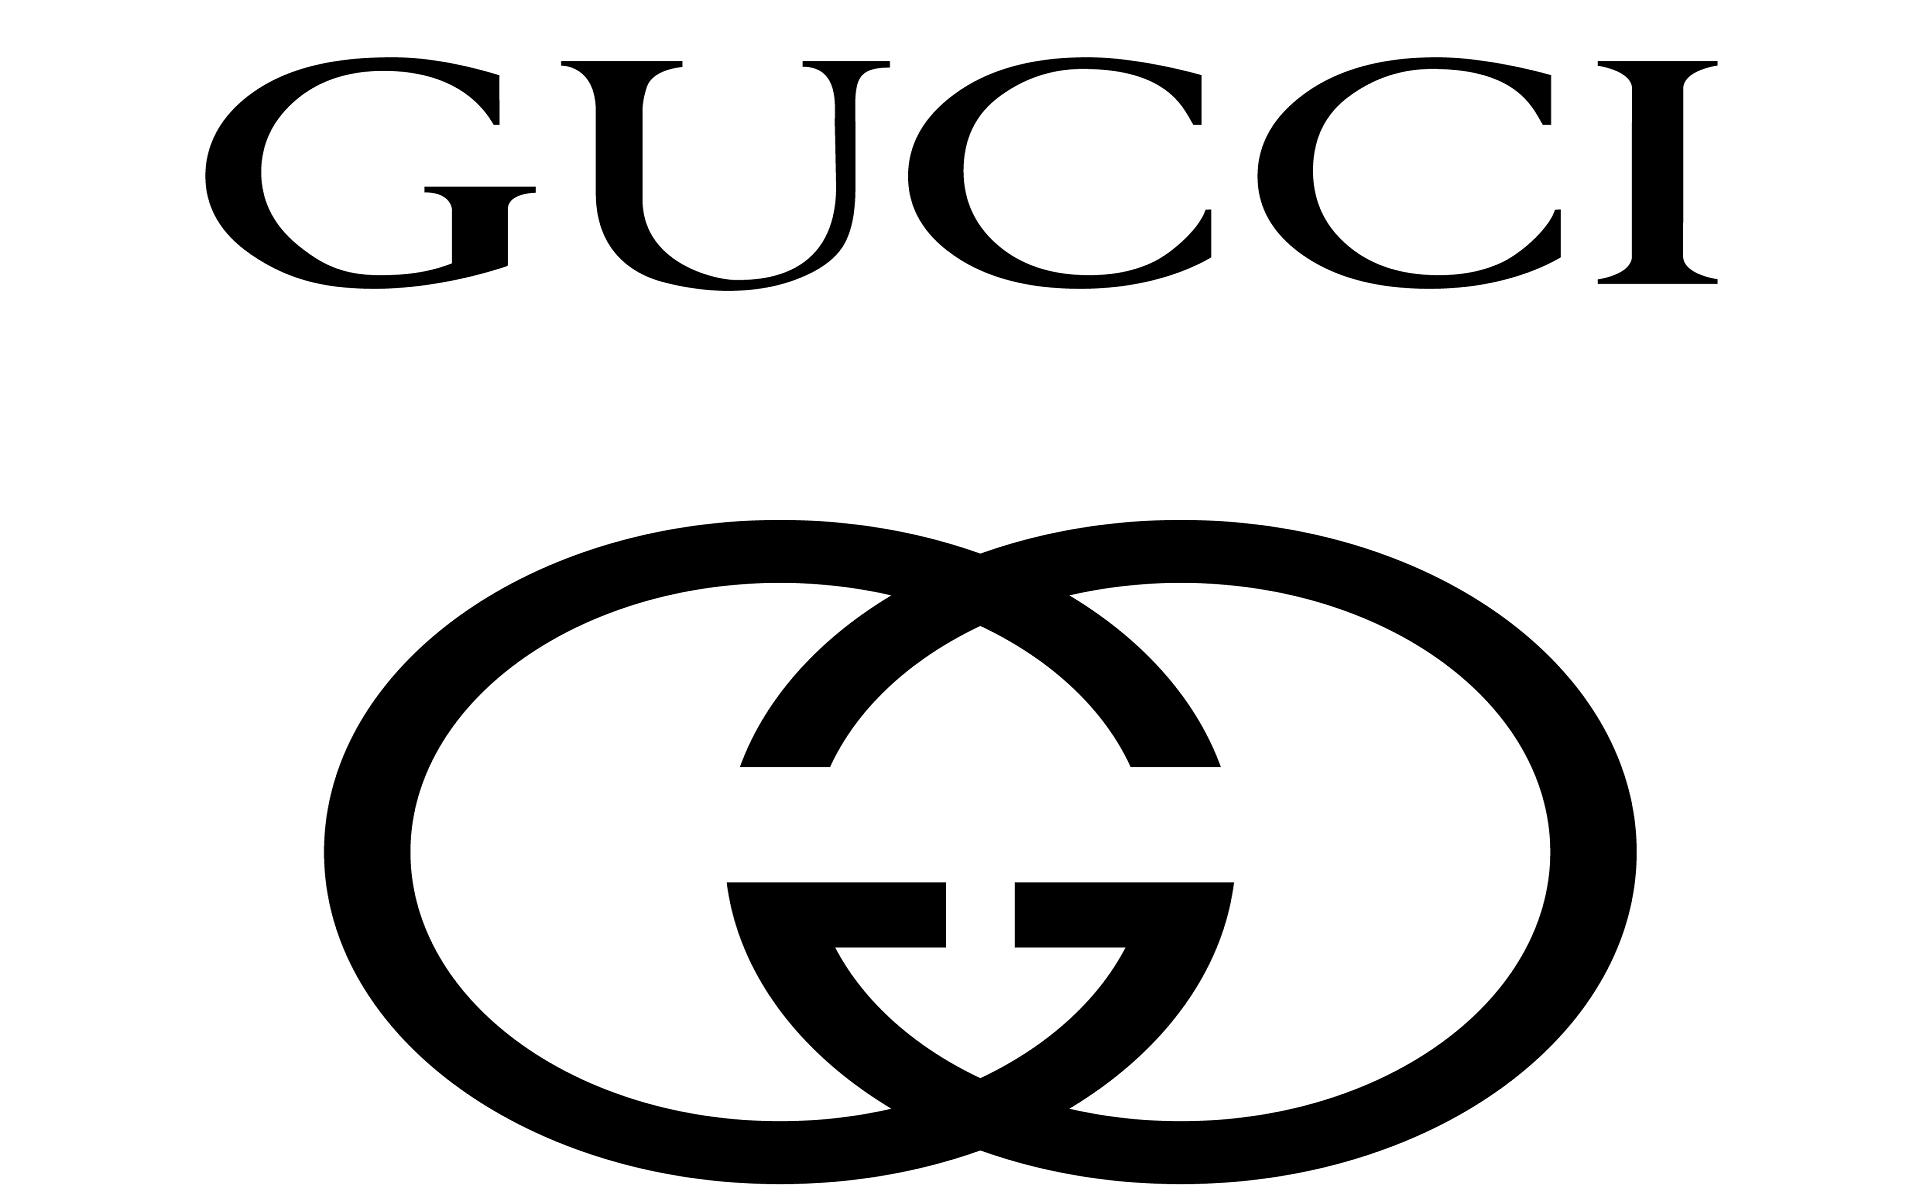 Football Wallpapers Hd Gucci Logo Wallpapers Hd Pixelstalk Net